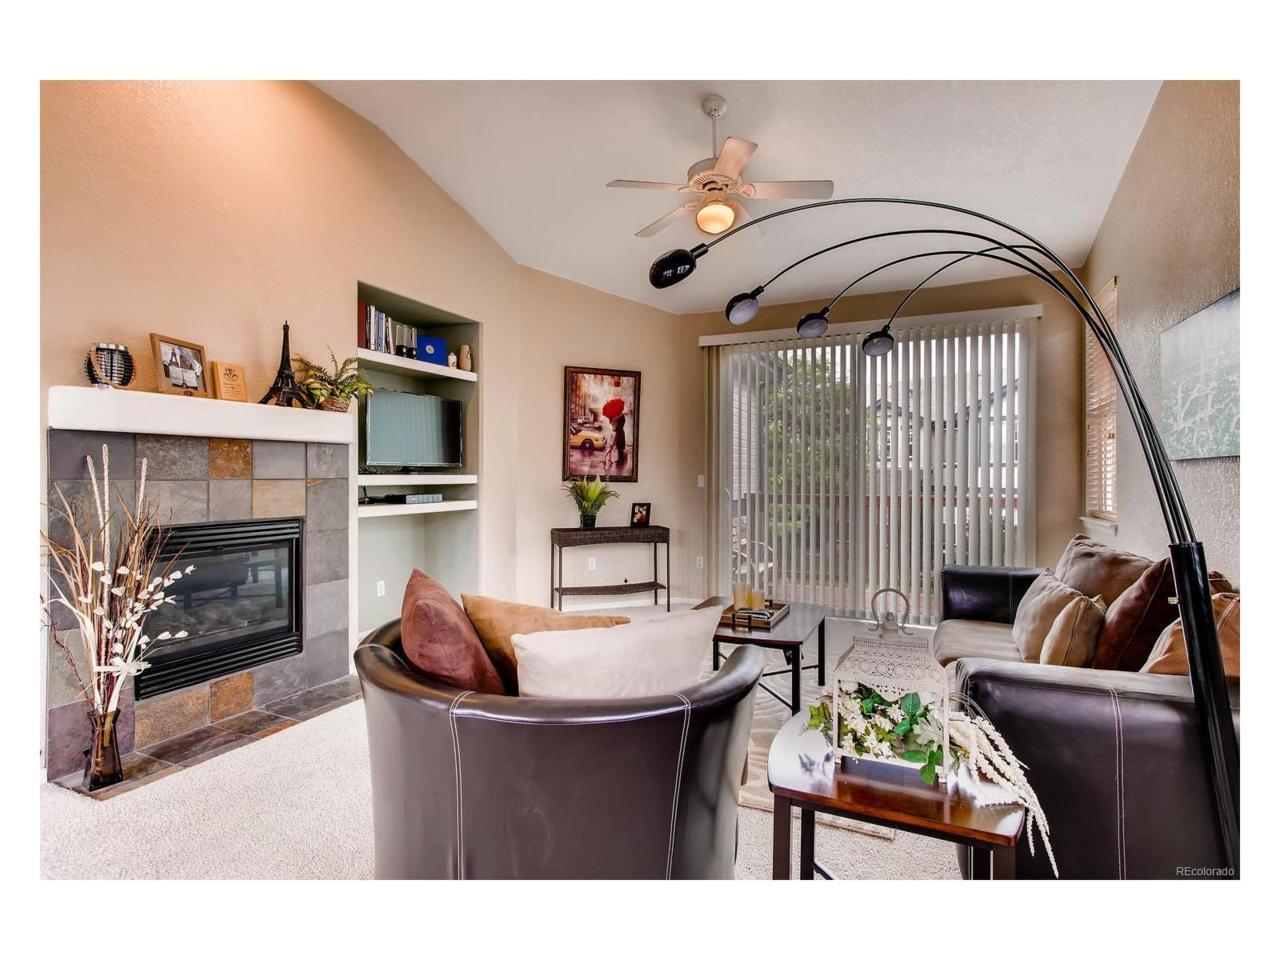 2142 S Fulton Circle #204, Aurora, CO 80247 (MLS #2414465) :: 8z Real Estate